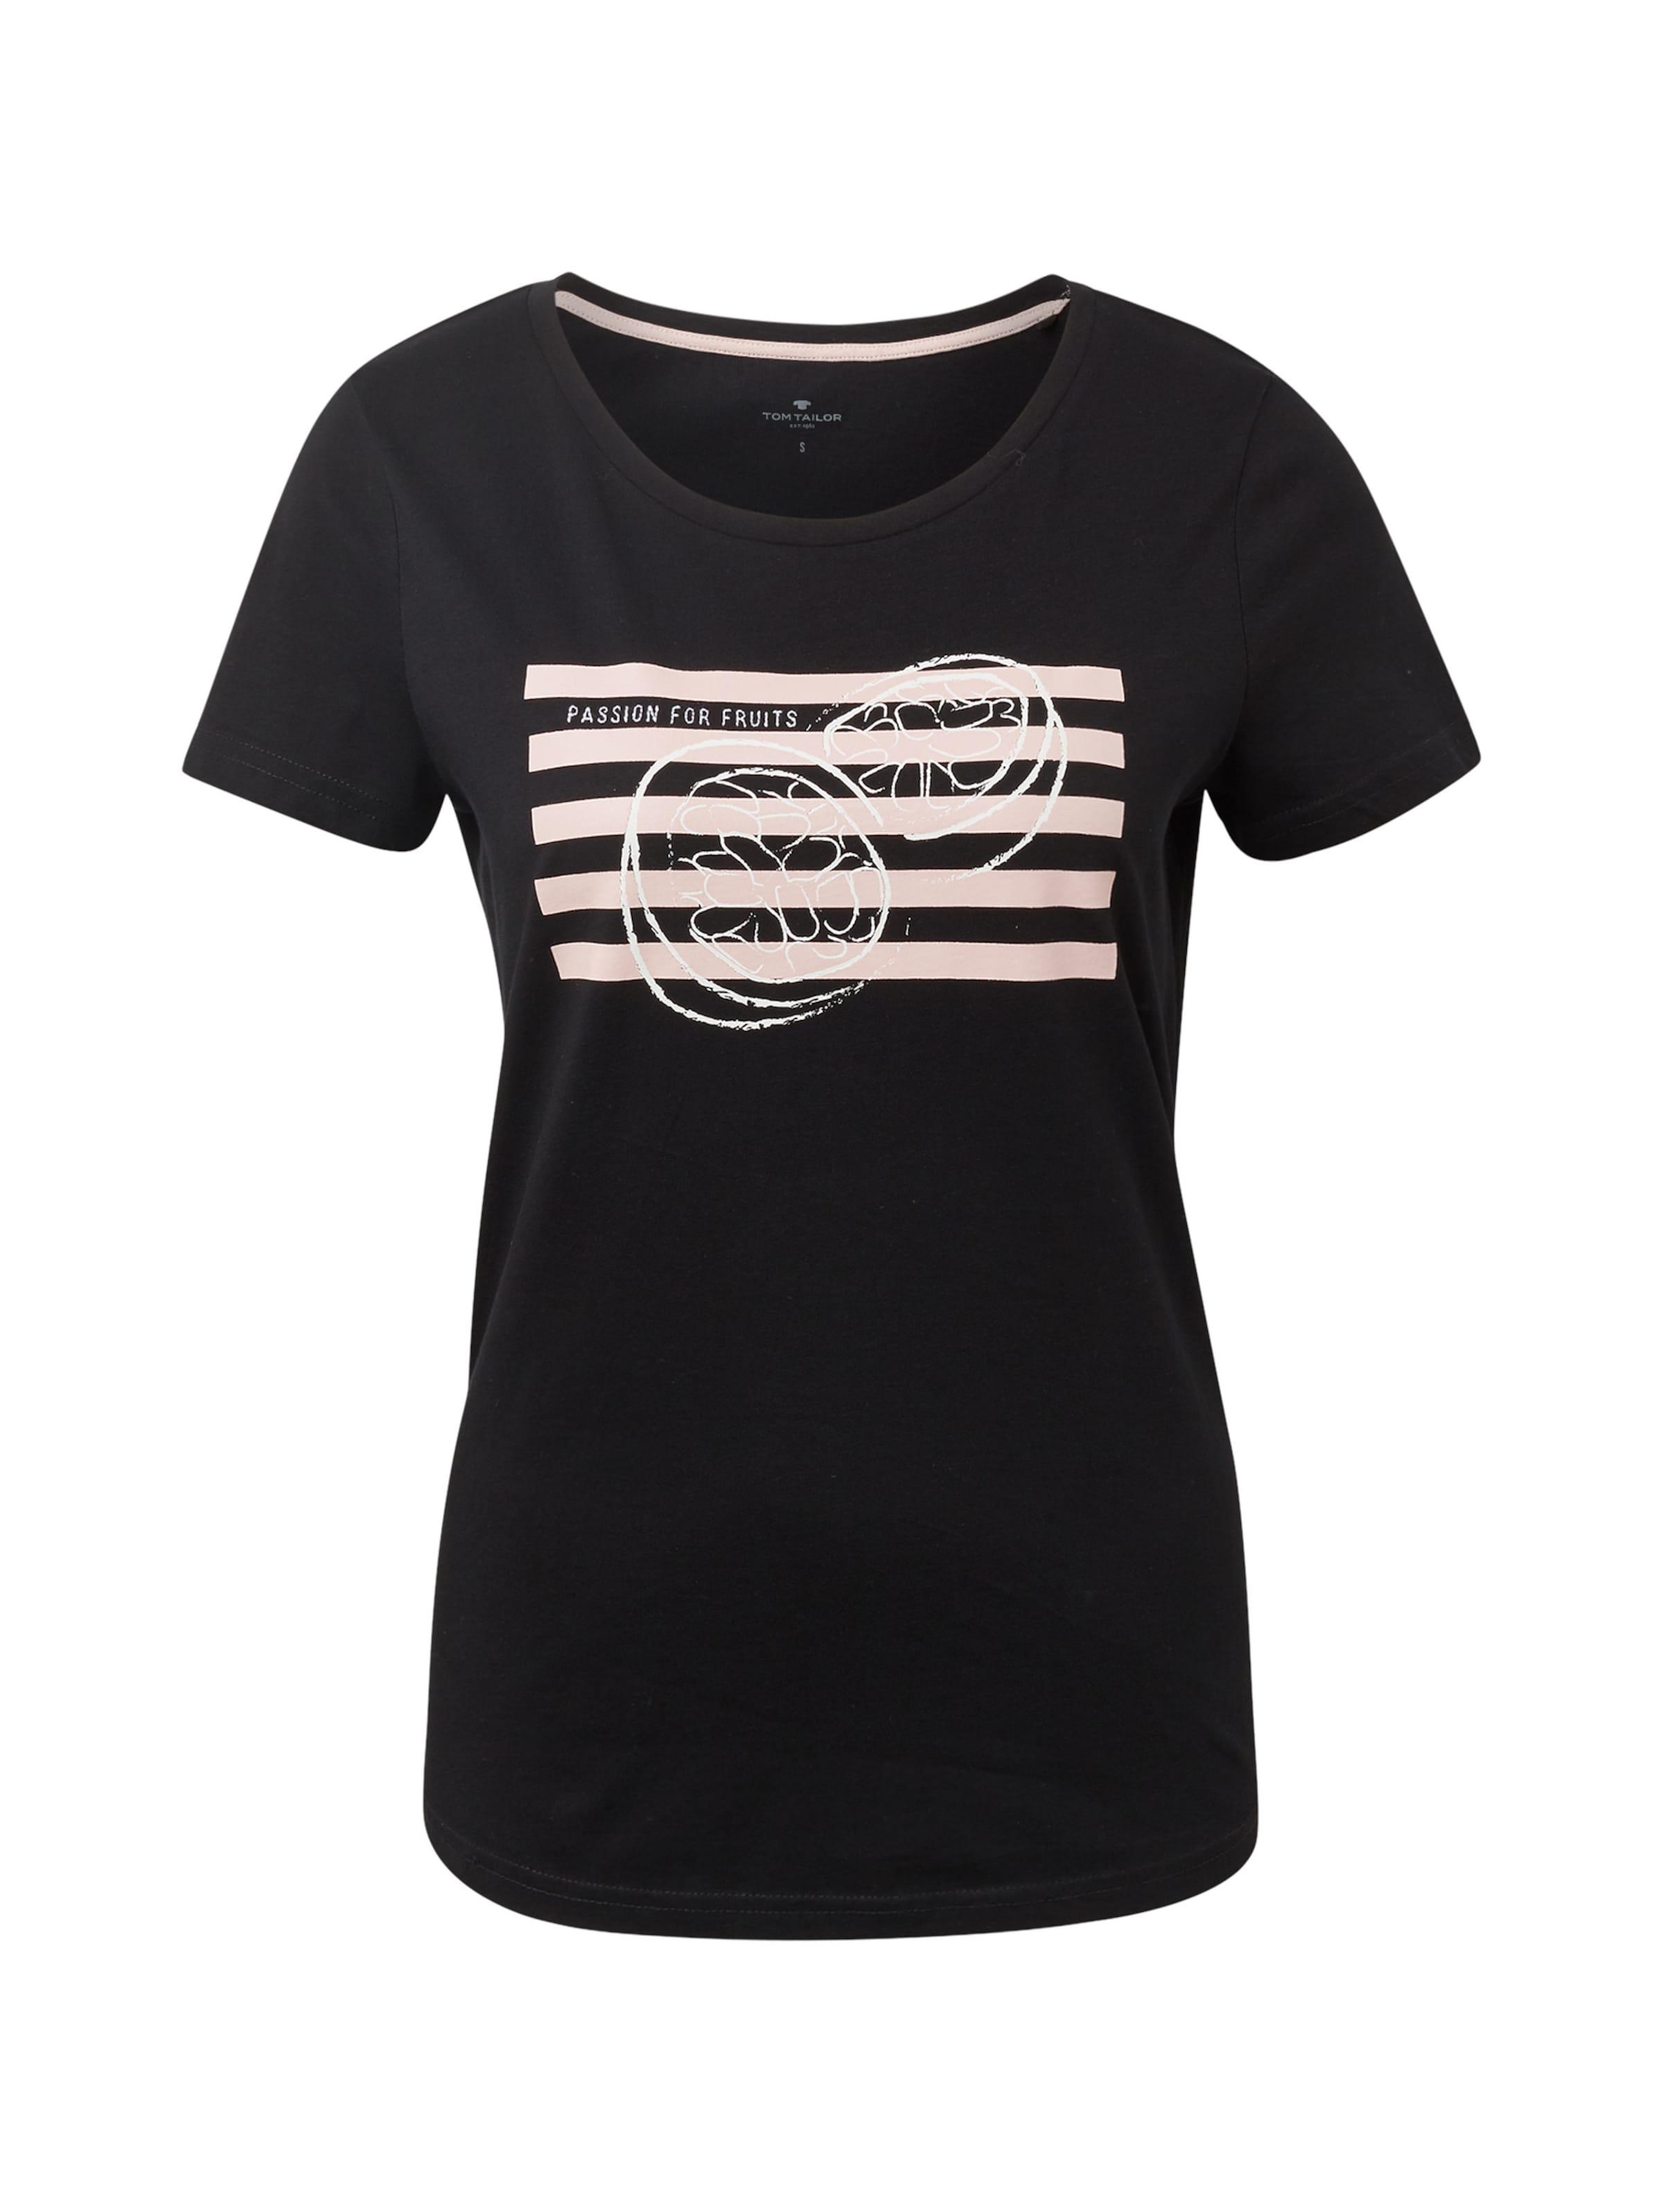 shirt In AltrosaSchwarz Weiß Tom T Tailor vgYbf76y